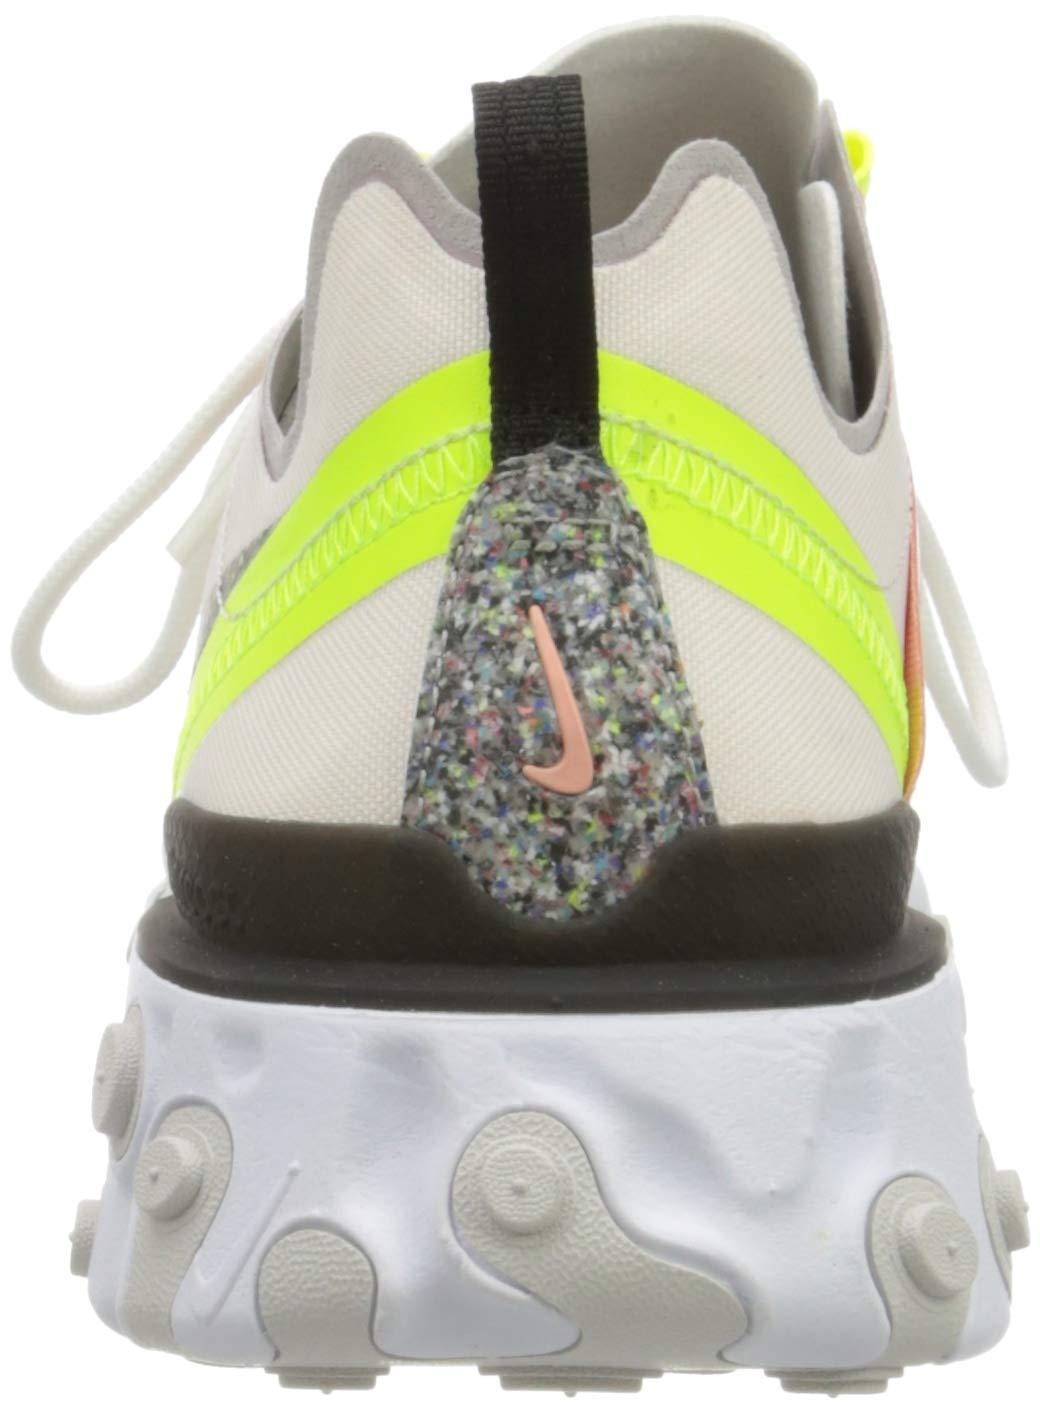 61CYj5k2wNL - Nike Women's W React Element 55 PRM Track & Field Shoes